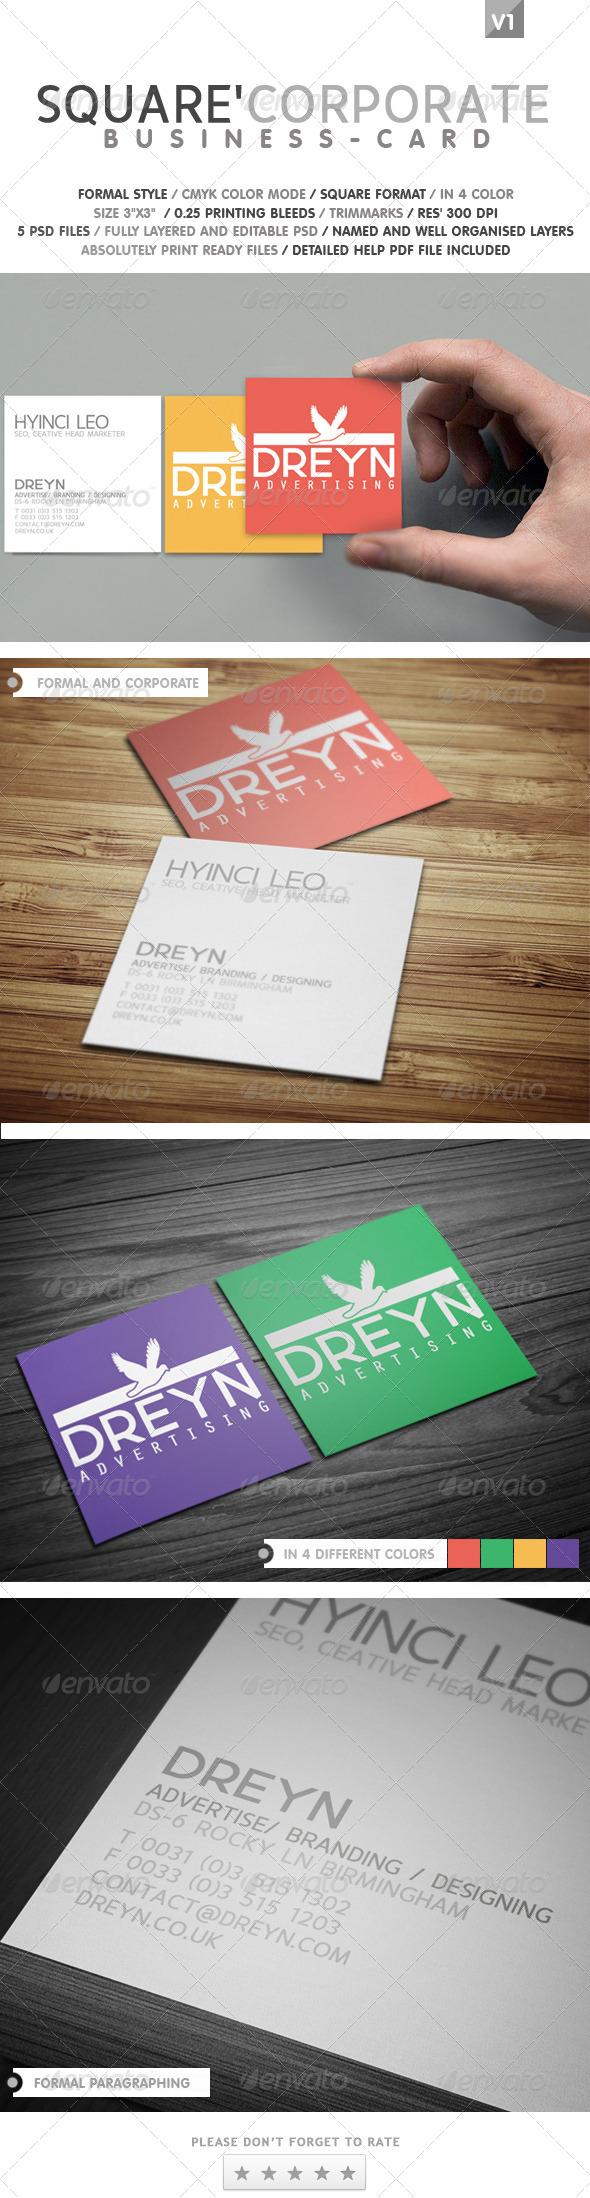 GraphicRiver Square Corporate Business Card 4918908